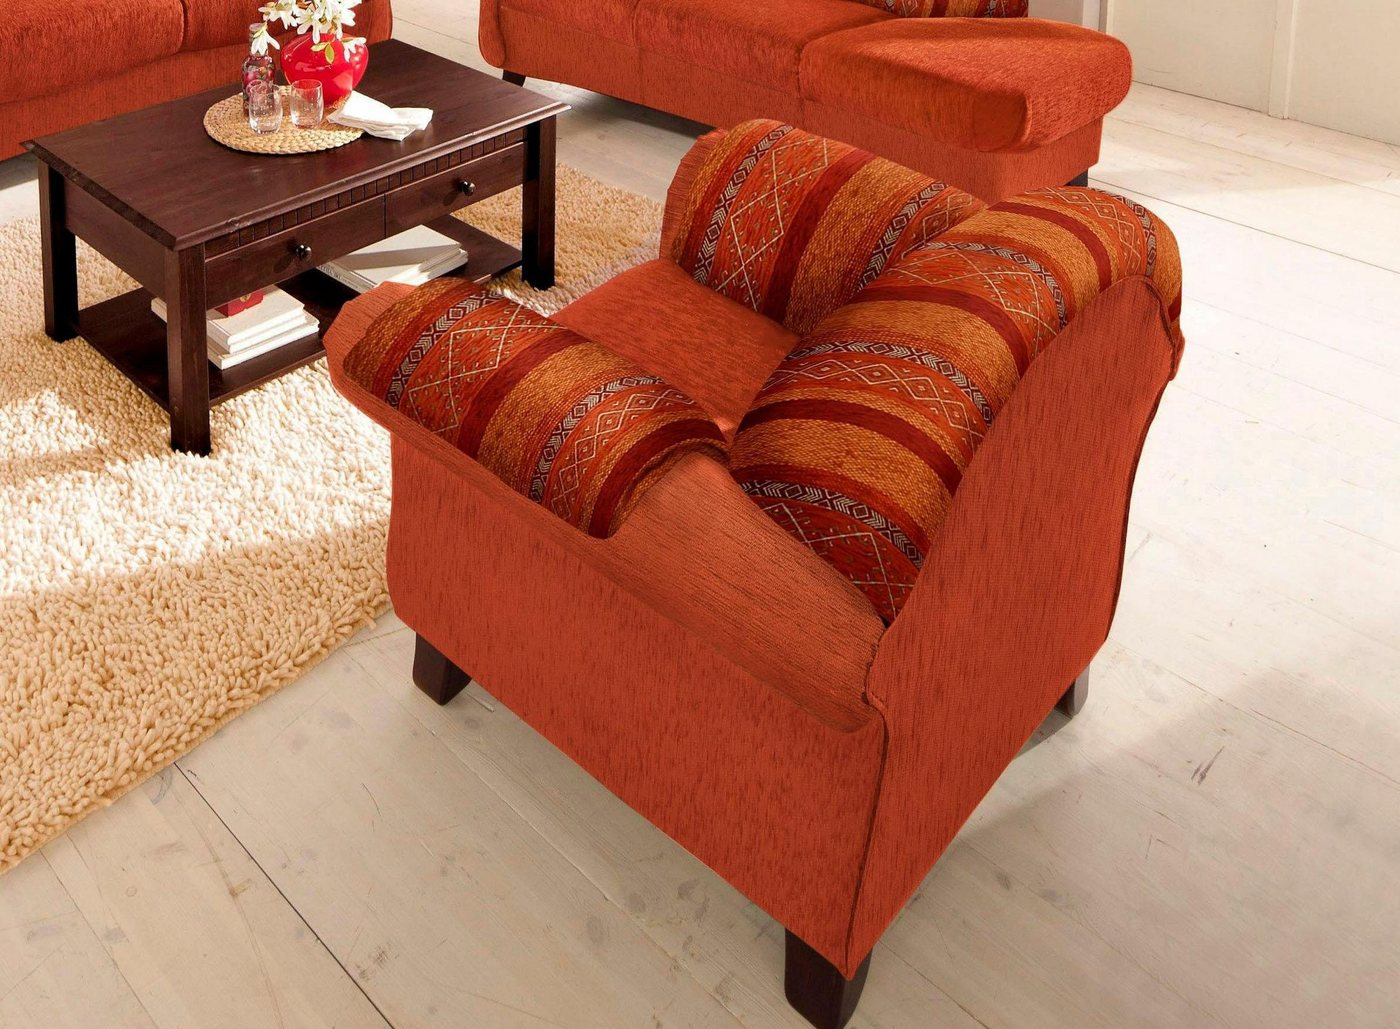 sessel kolonialstil preisvergleiche erfahrungsberichte. Black Bedroom Furniture Sets. Home Design Ideas